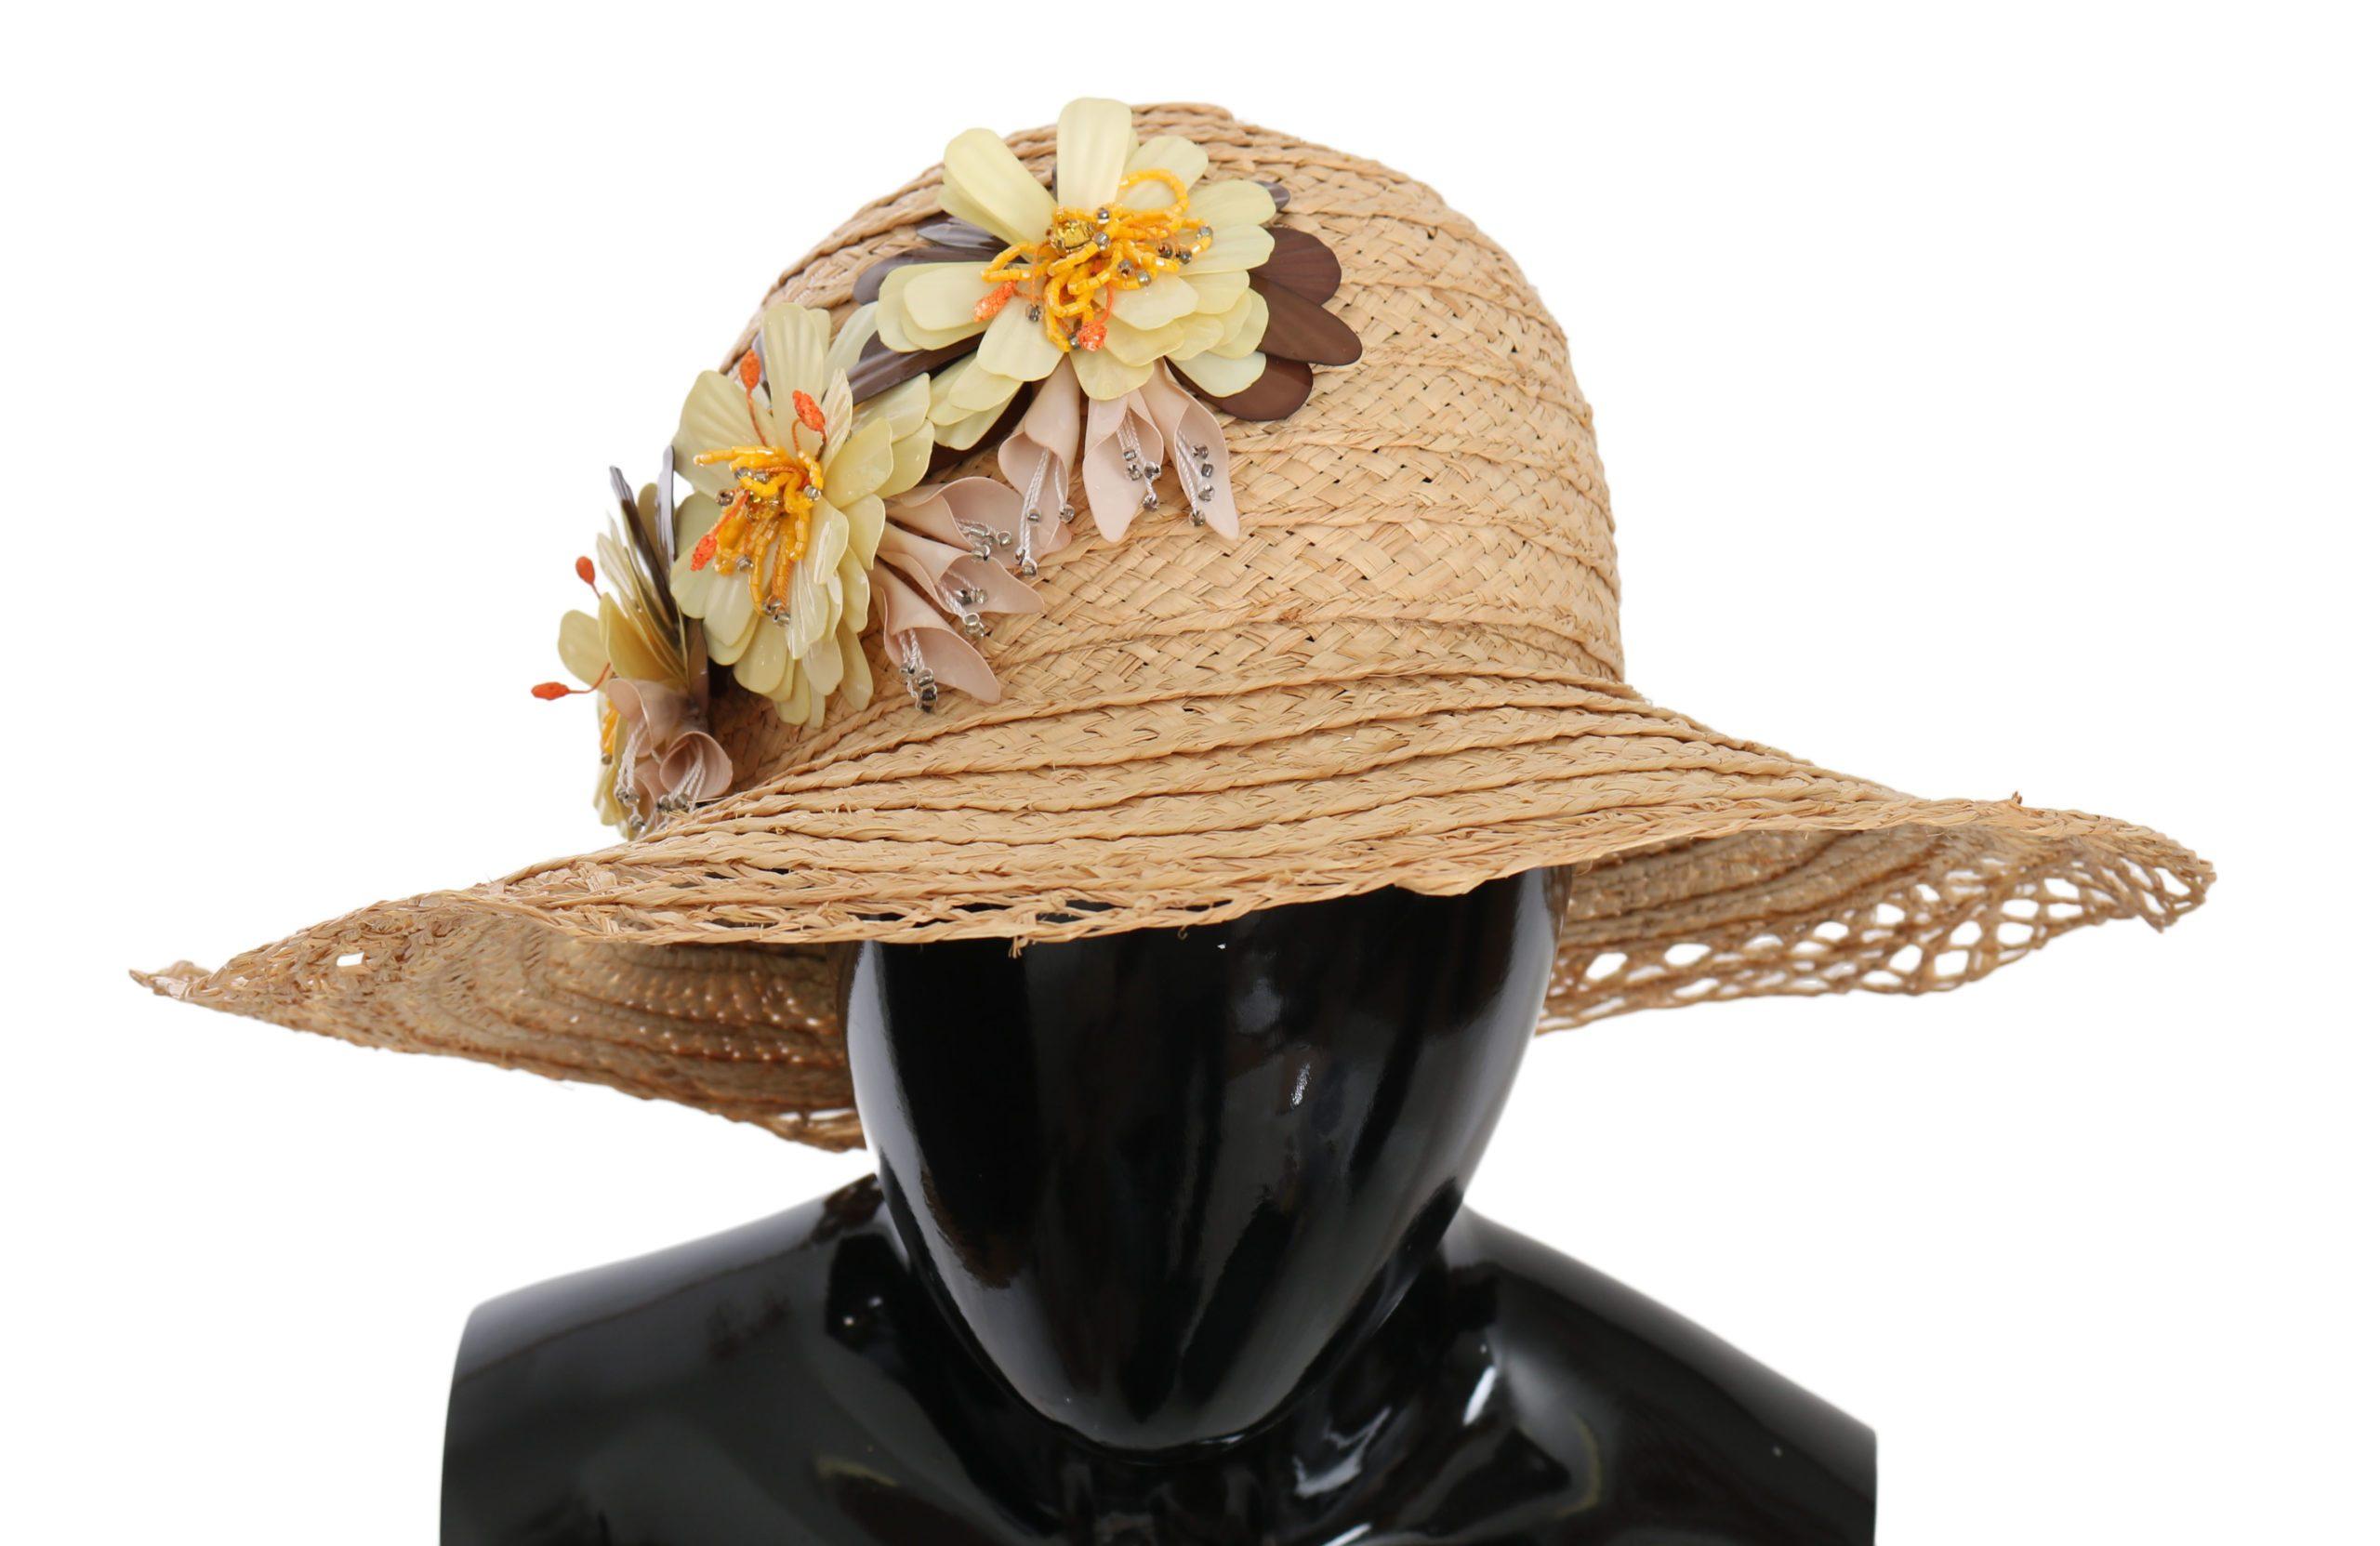 Dolce & Gabbana Women's Wide Brim Floral Capello Hat Beige HAT70225 - 56 cm|XS